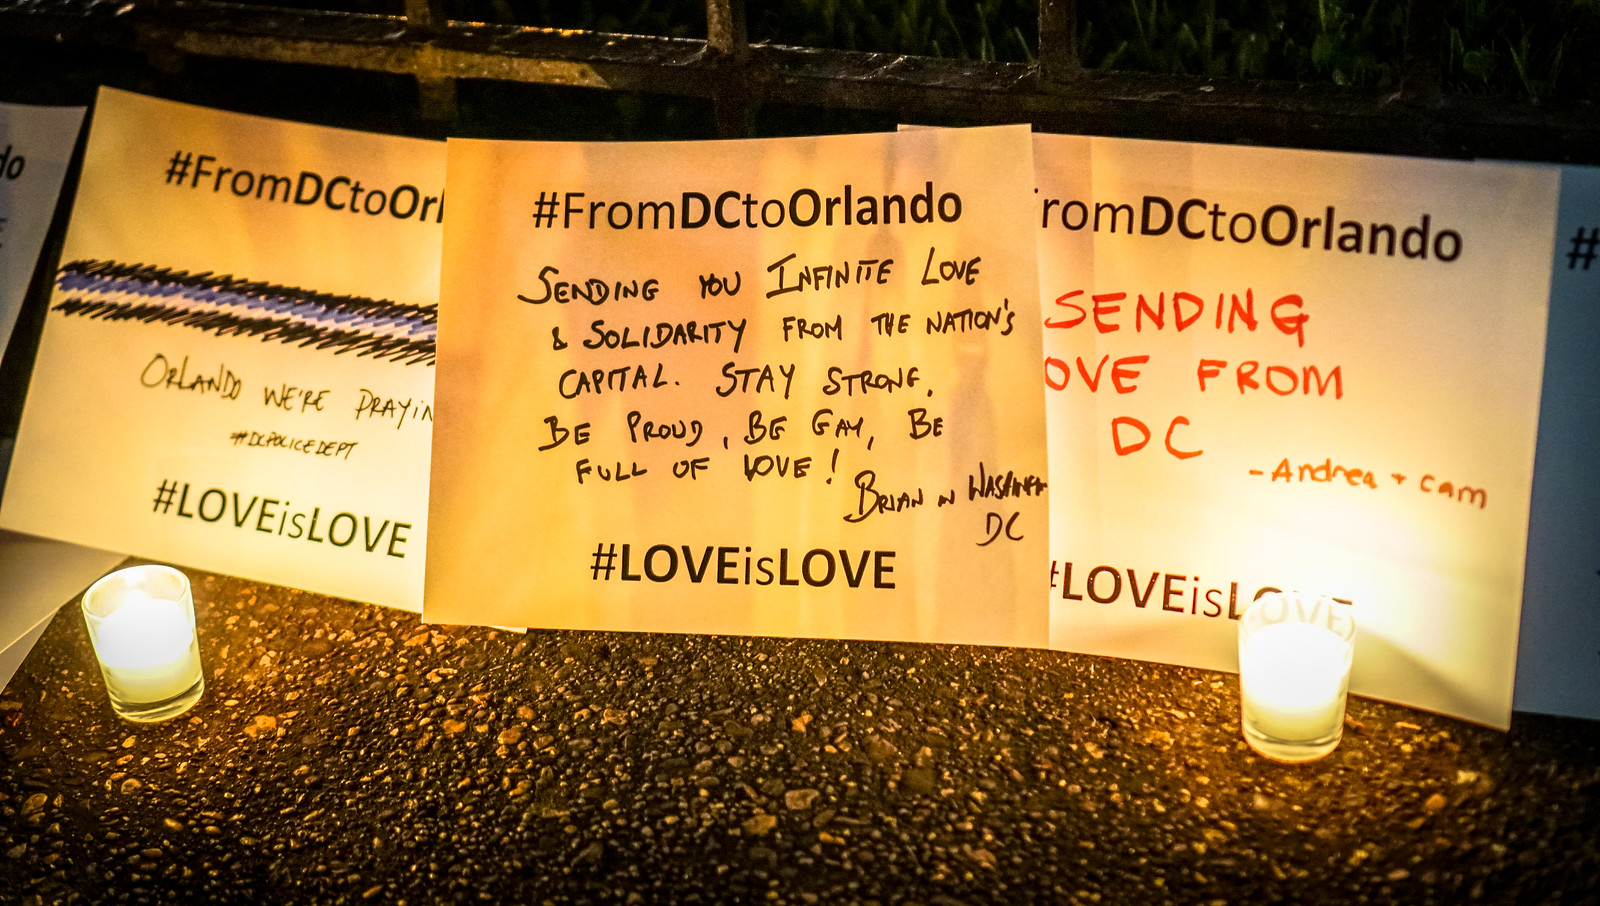 2016.06.13 From DC to Orlando Vigils 06128